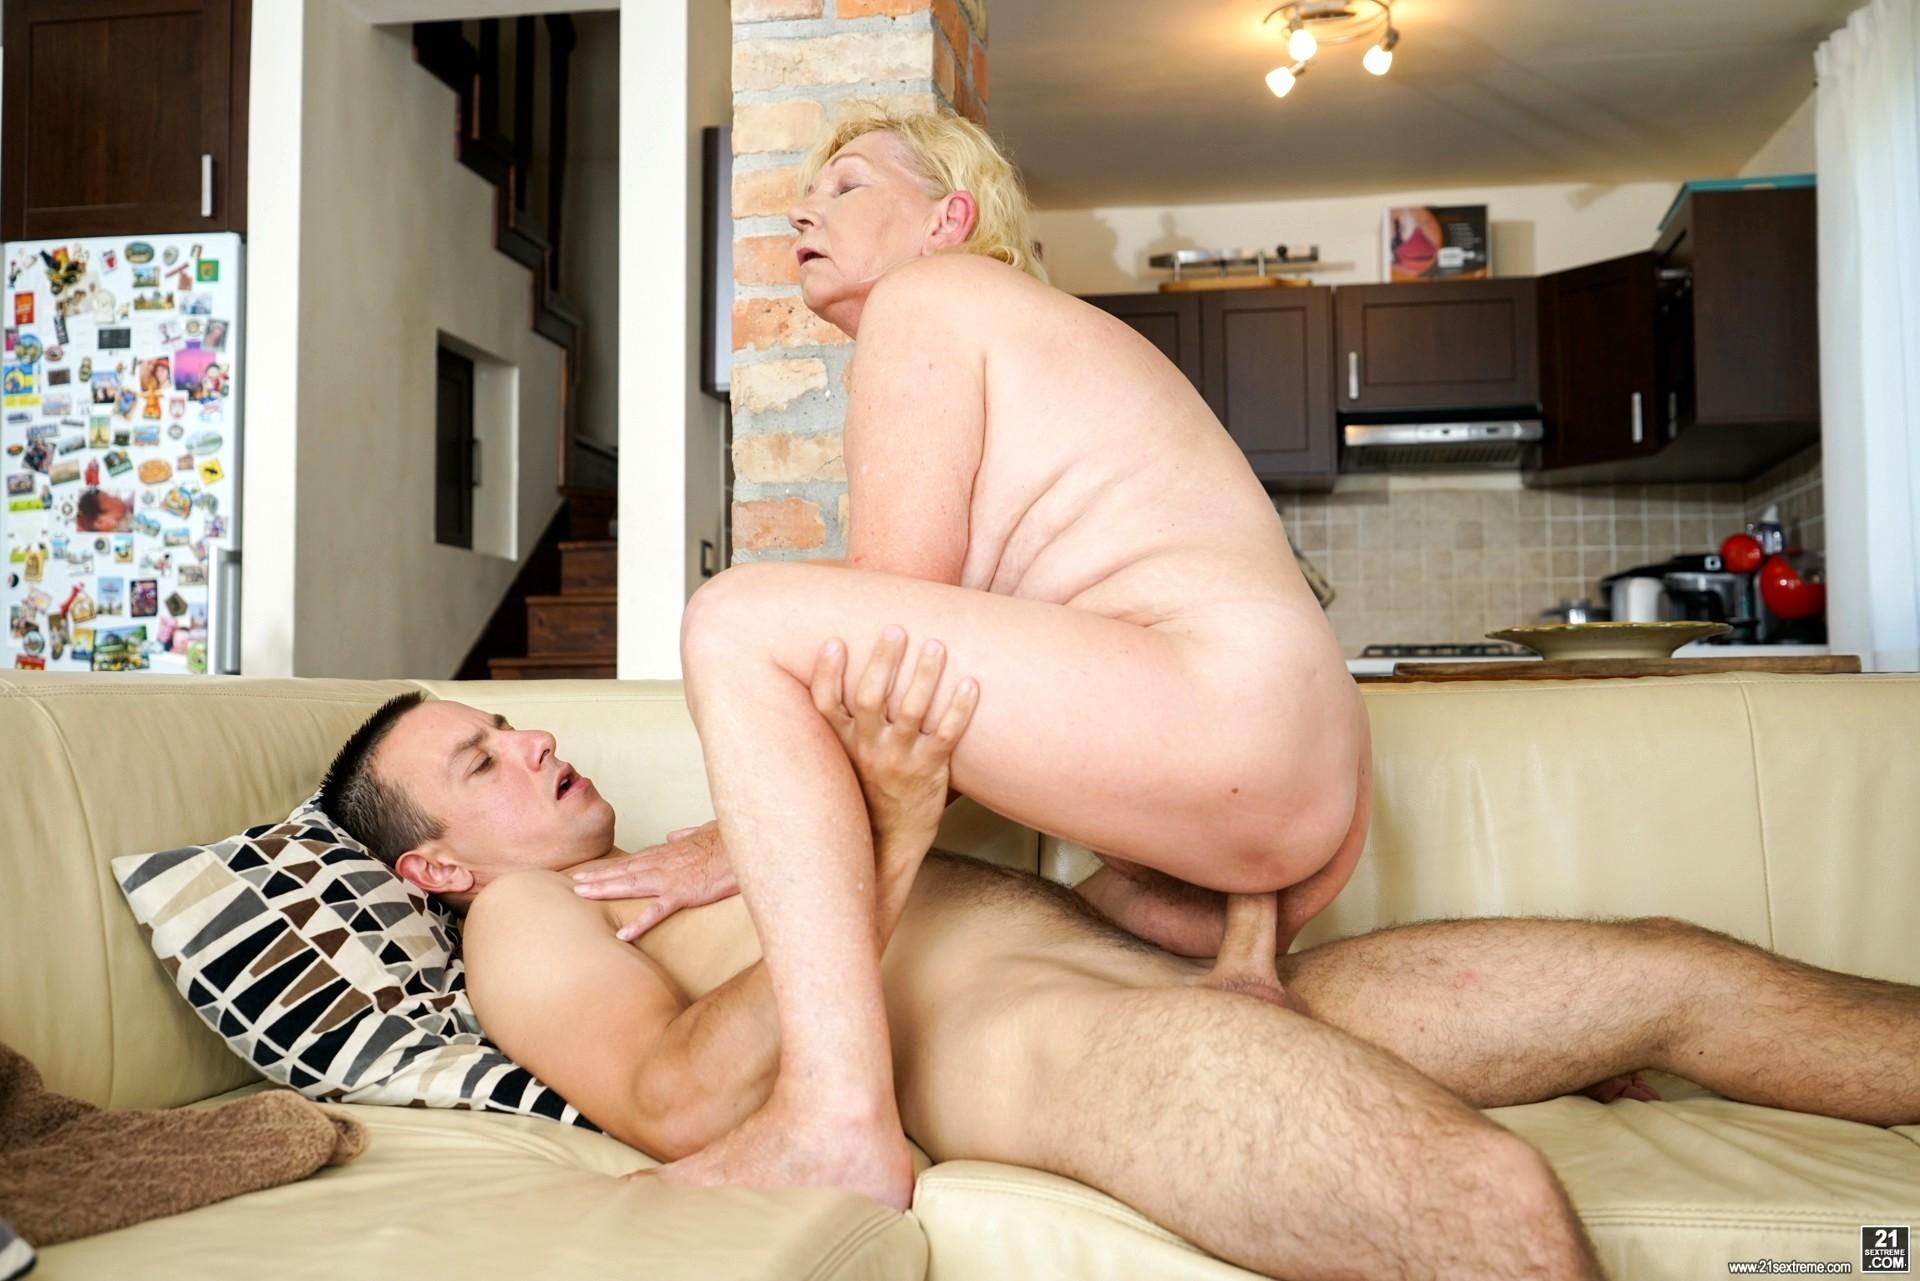 21sextreme Alla Hyper Granny Zip Sex Hd Pics